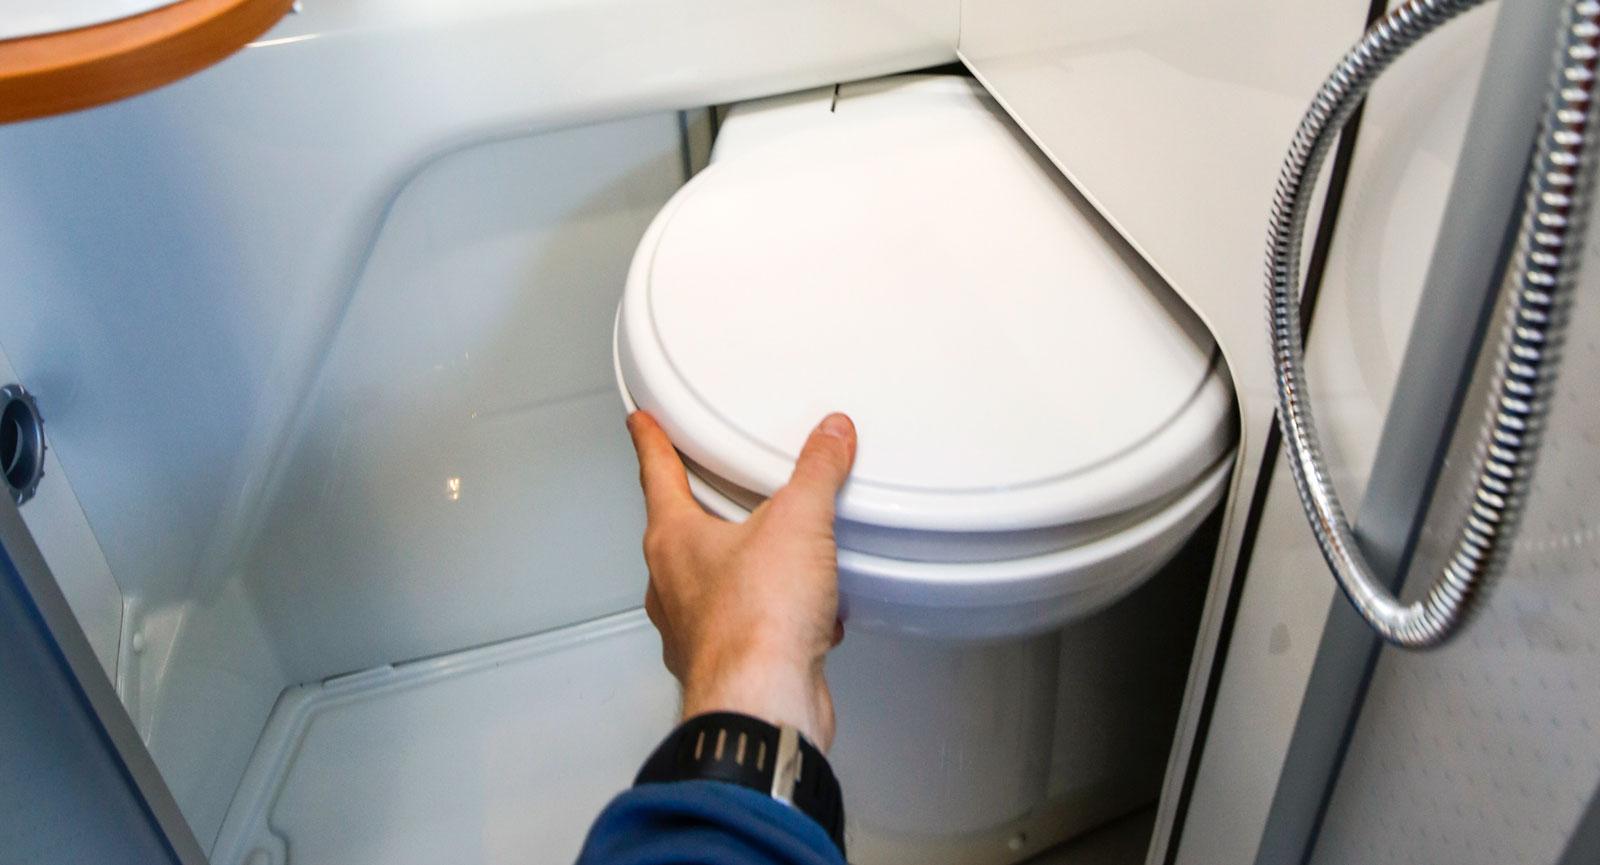 Toaletten skjuts enkelt in i väggen vilket sparar enormt med utrymme.